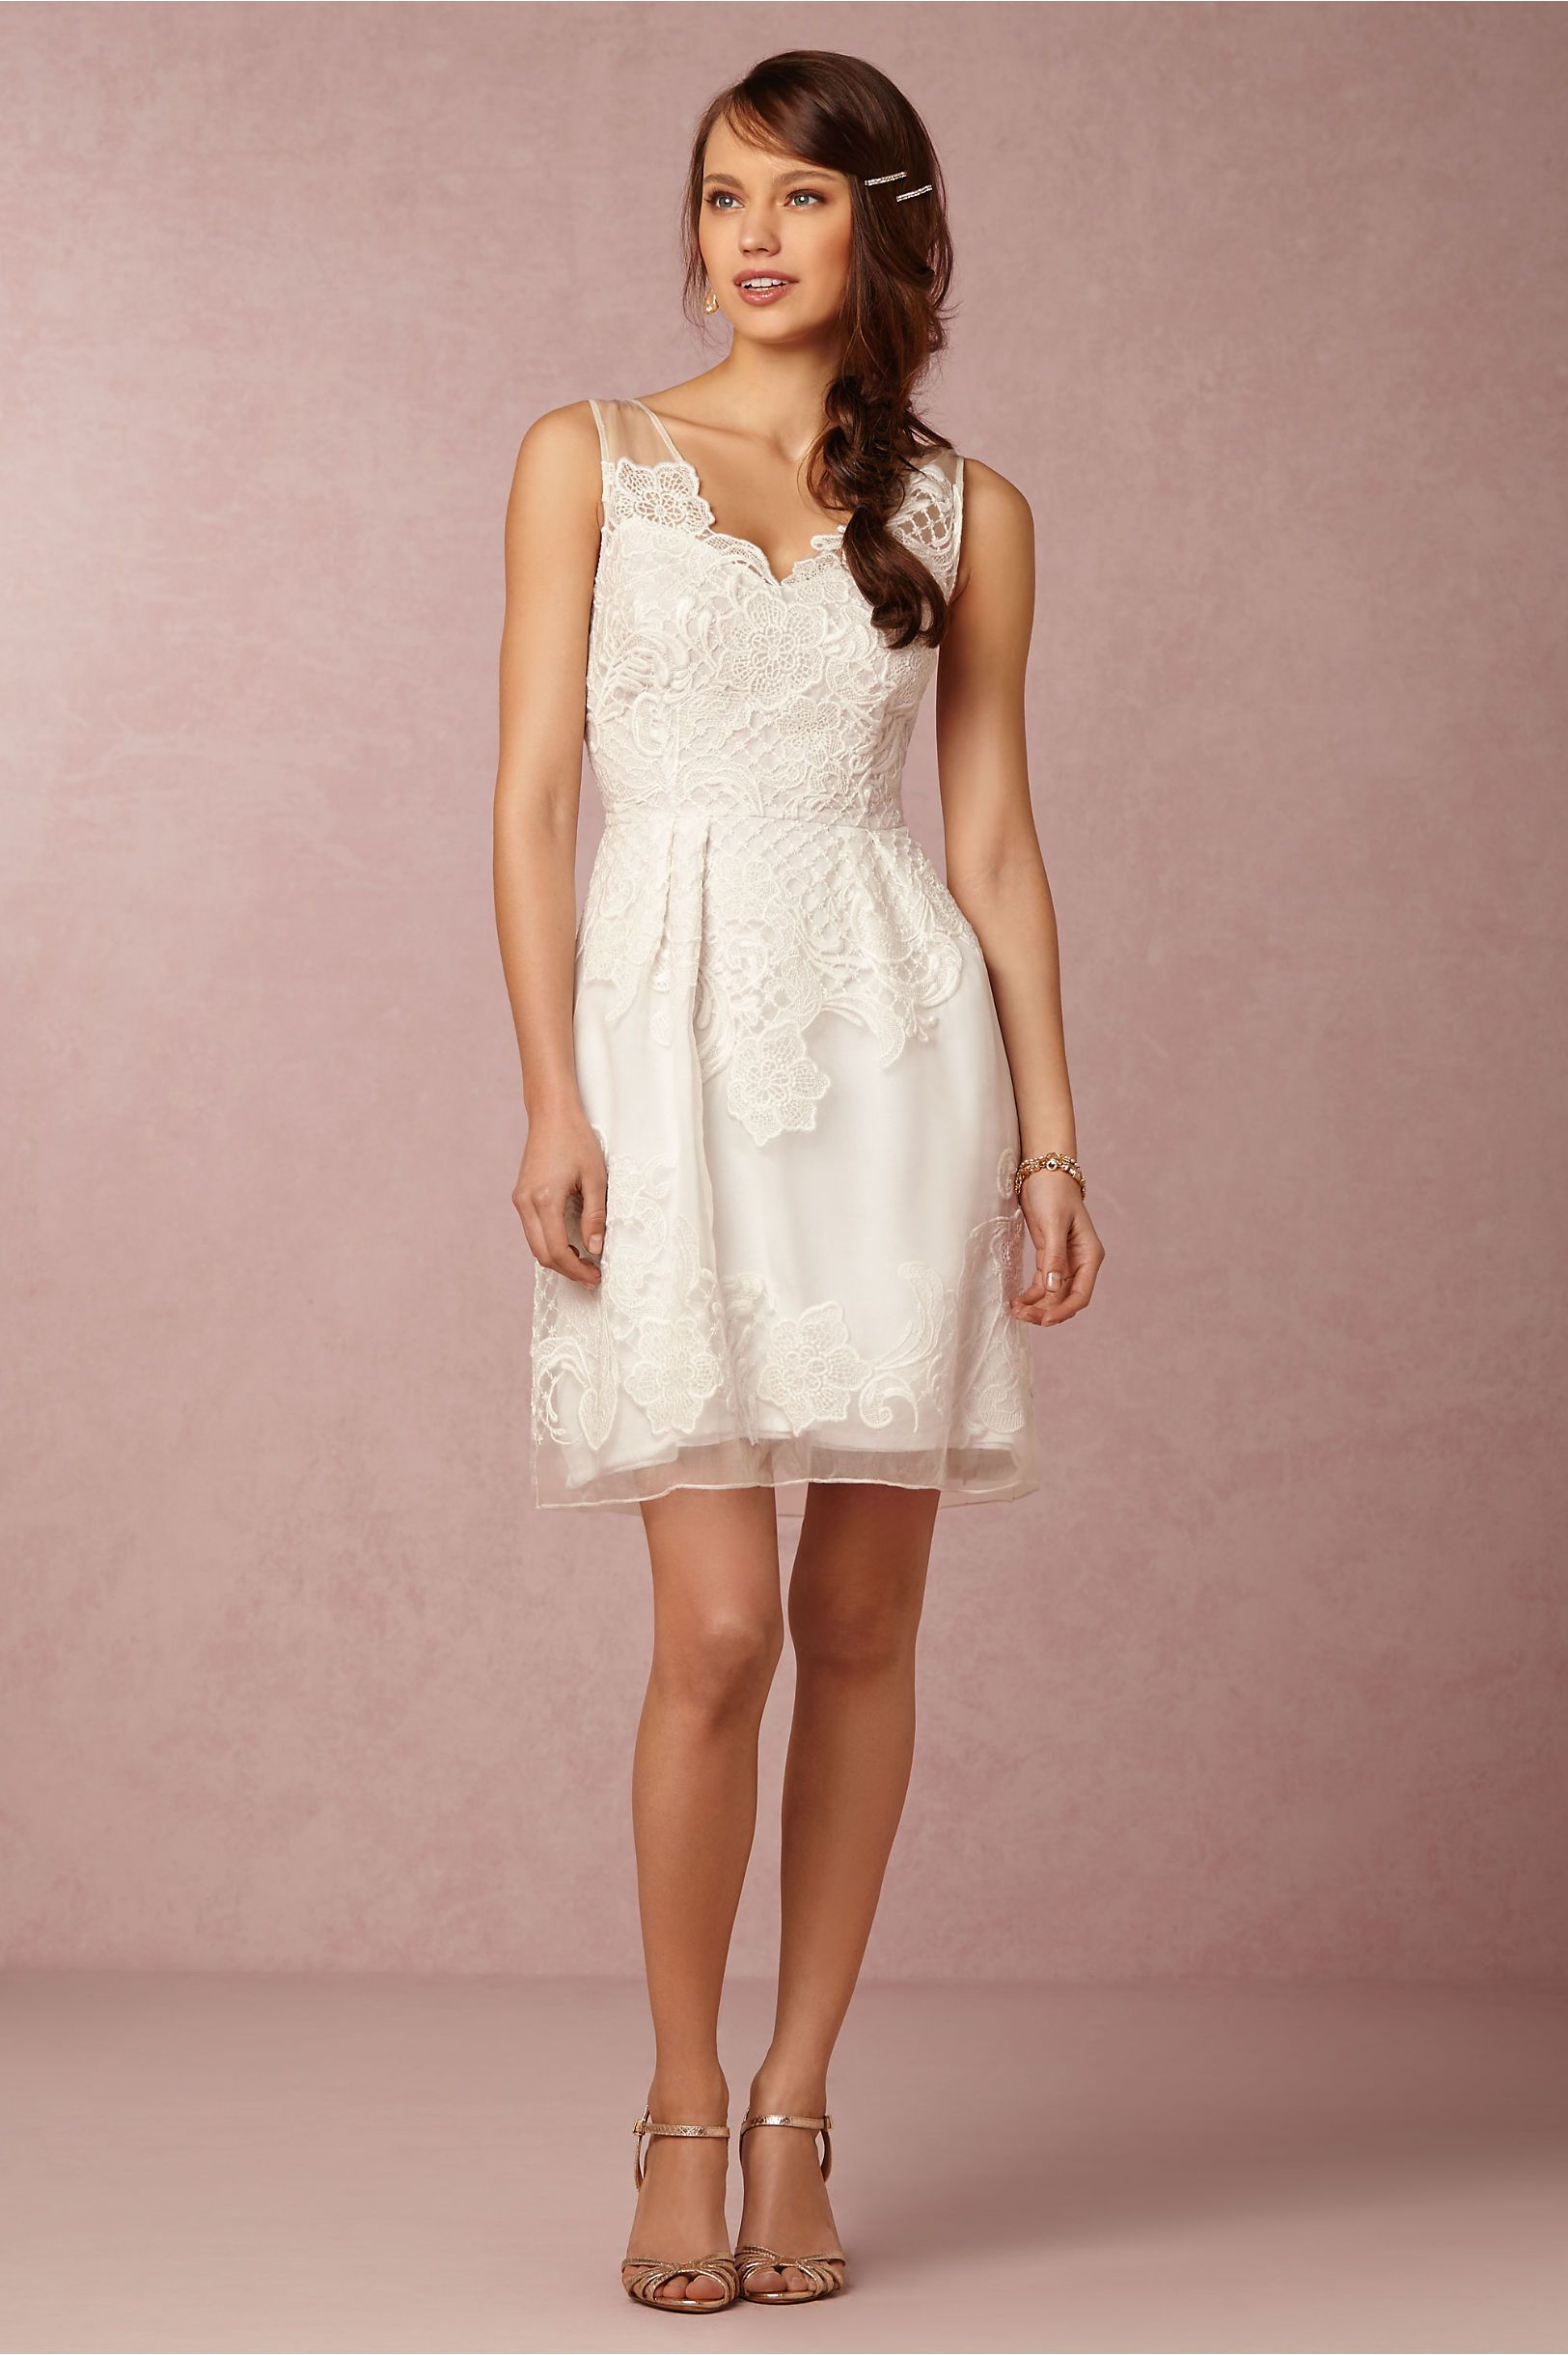 reception or bridal shower dress | Celestina Dress from @BHLDN | The ...